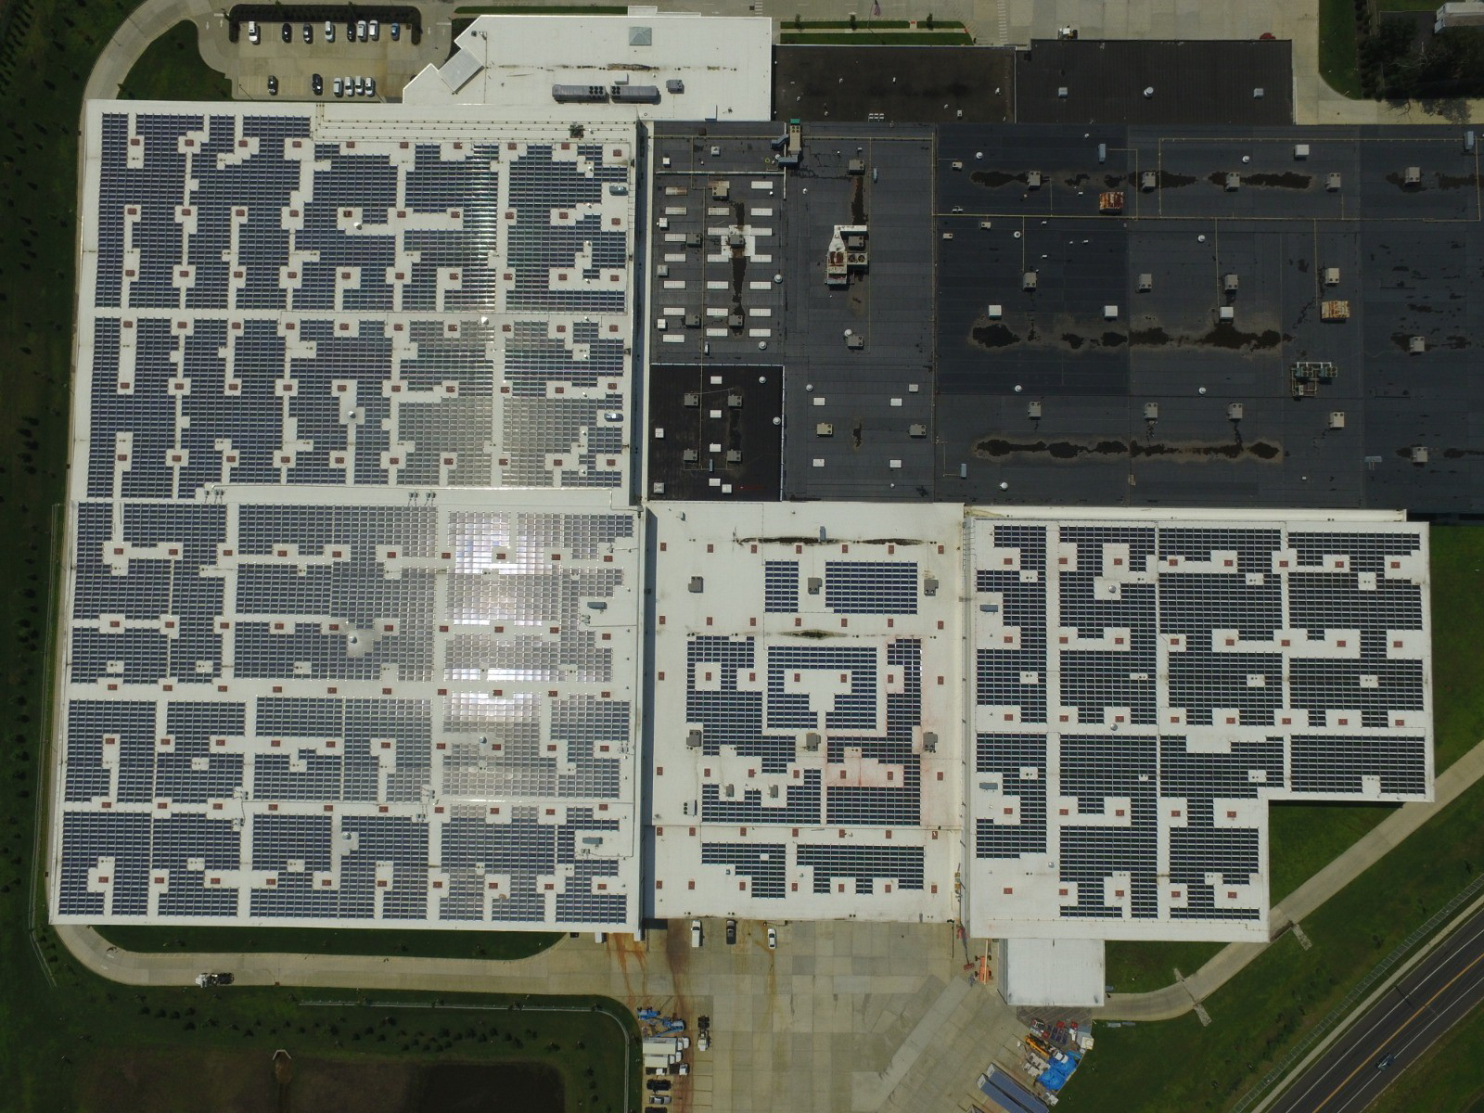 Dayton- 3 MW